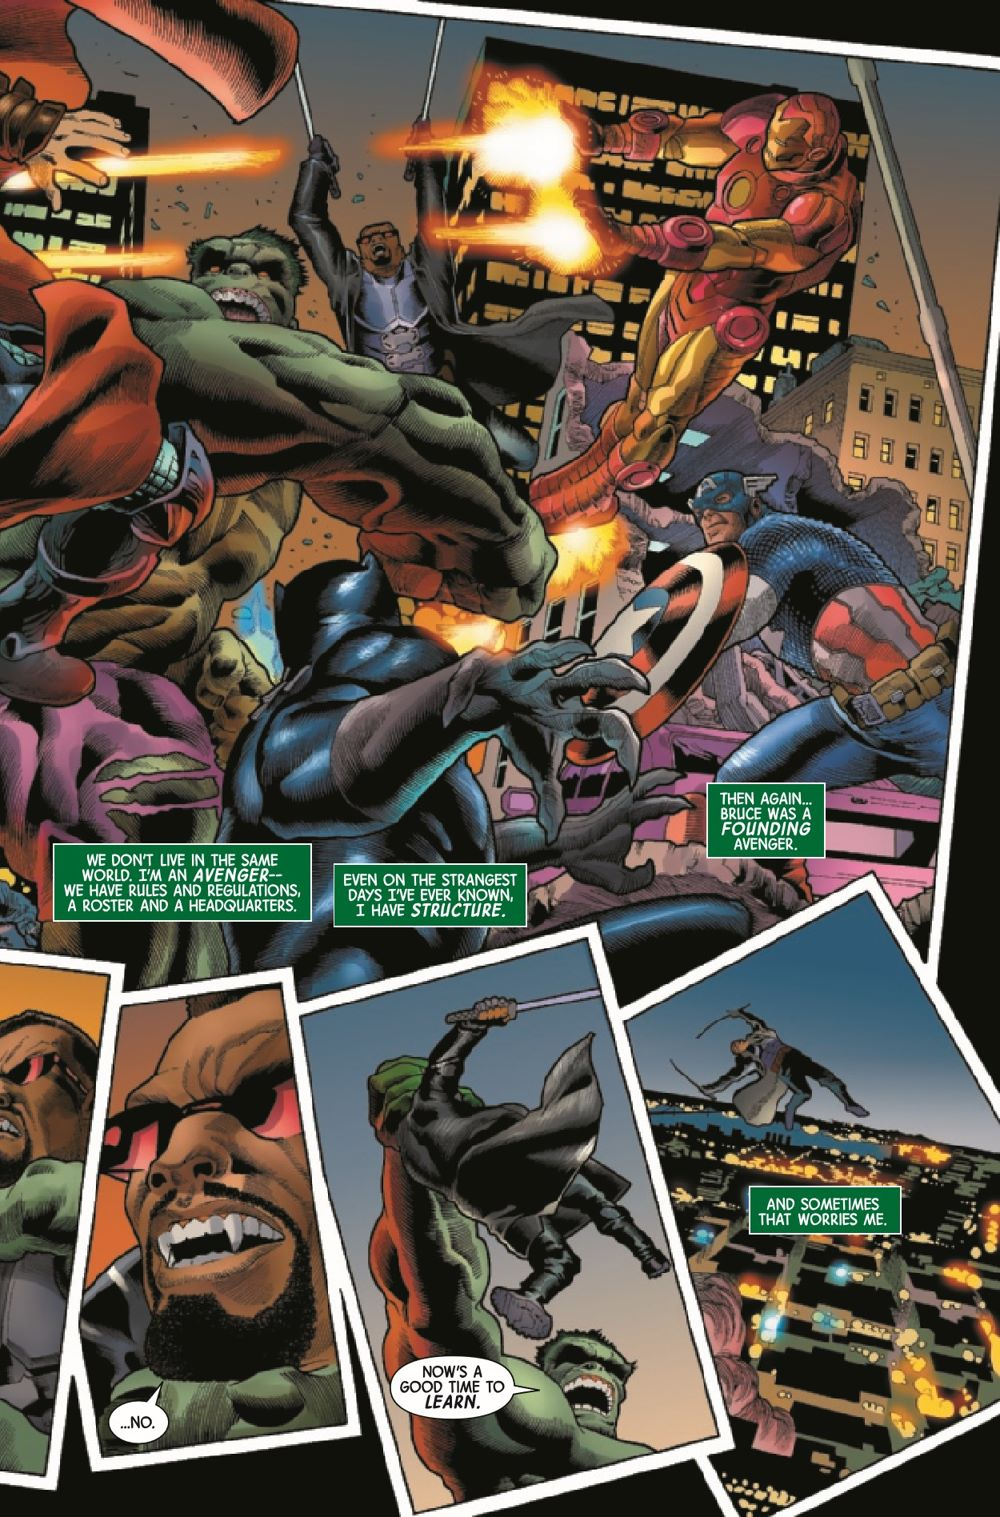 HULK2018047_Preview-4 ComicList Previews: THE IMMORTAL HULK #47